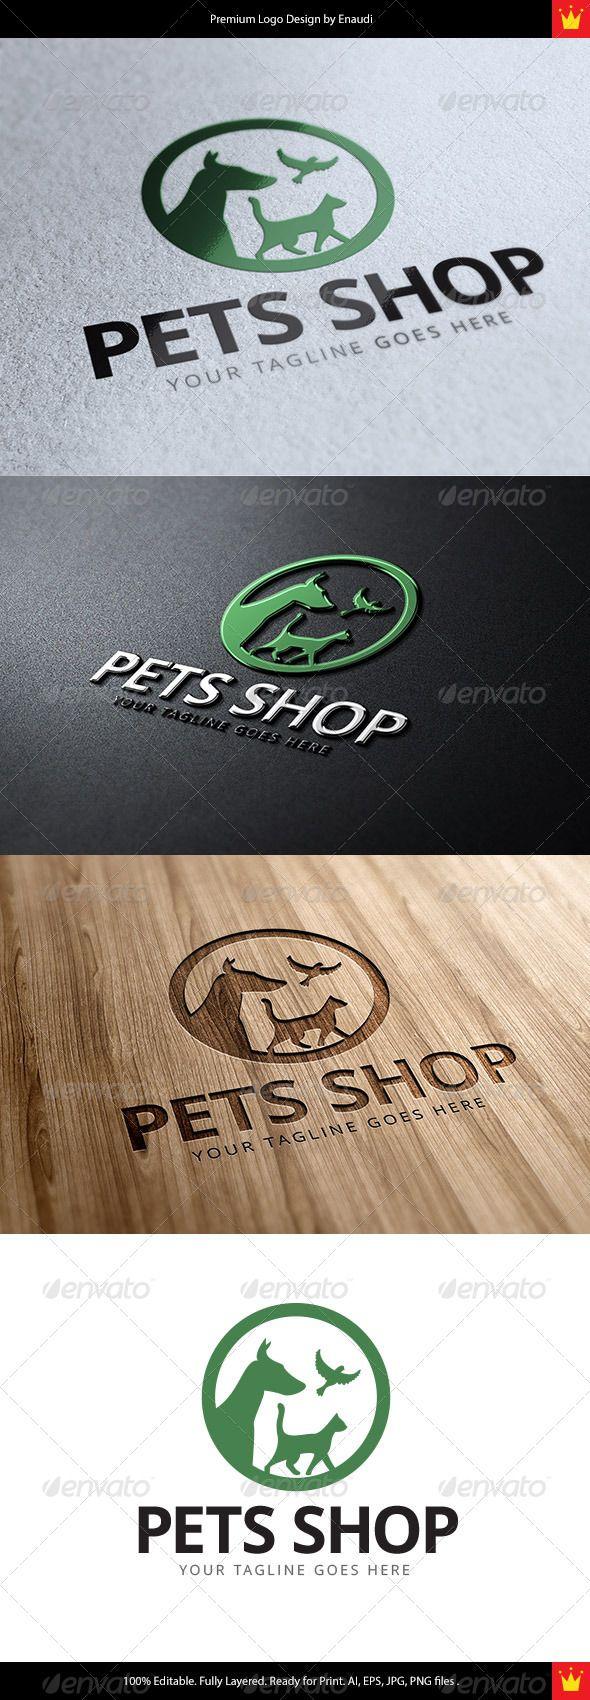 Pets Shop Logo — Vector EPS #branding #vetoerinary • Available here → https://graphicriver.net/item/pets-shop-logo/7864769?ref=pxcr